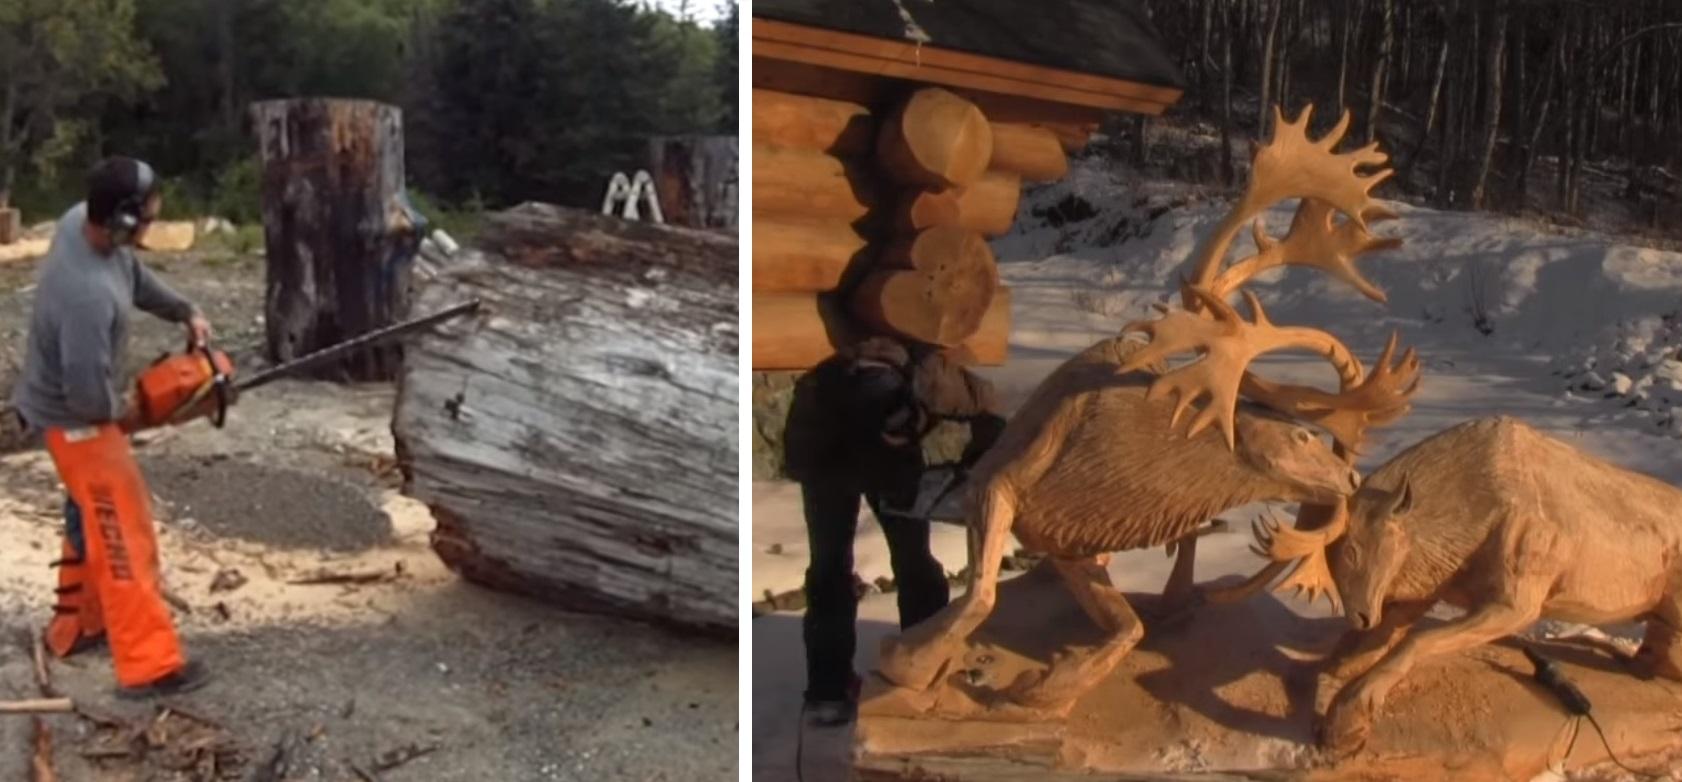 Carving with ian norbury michael keller woodcarving